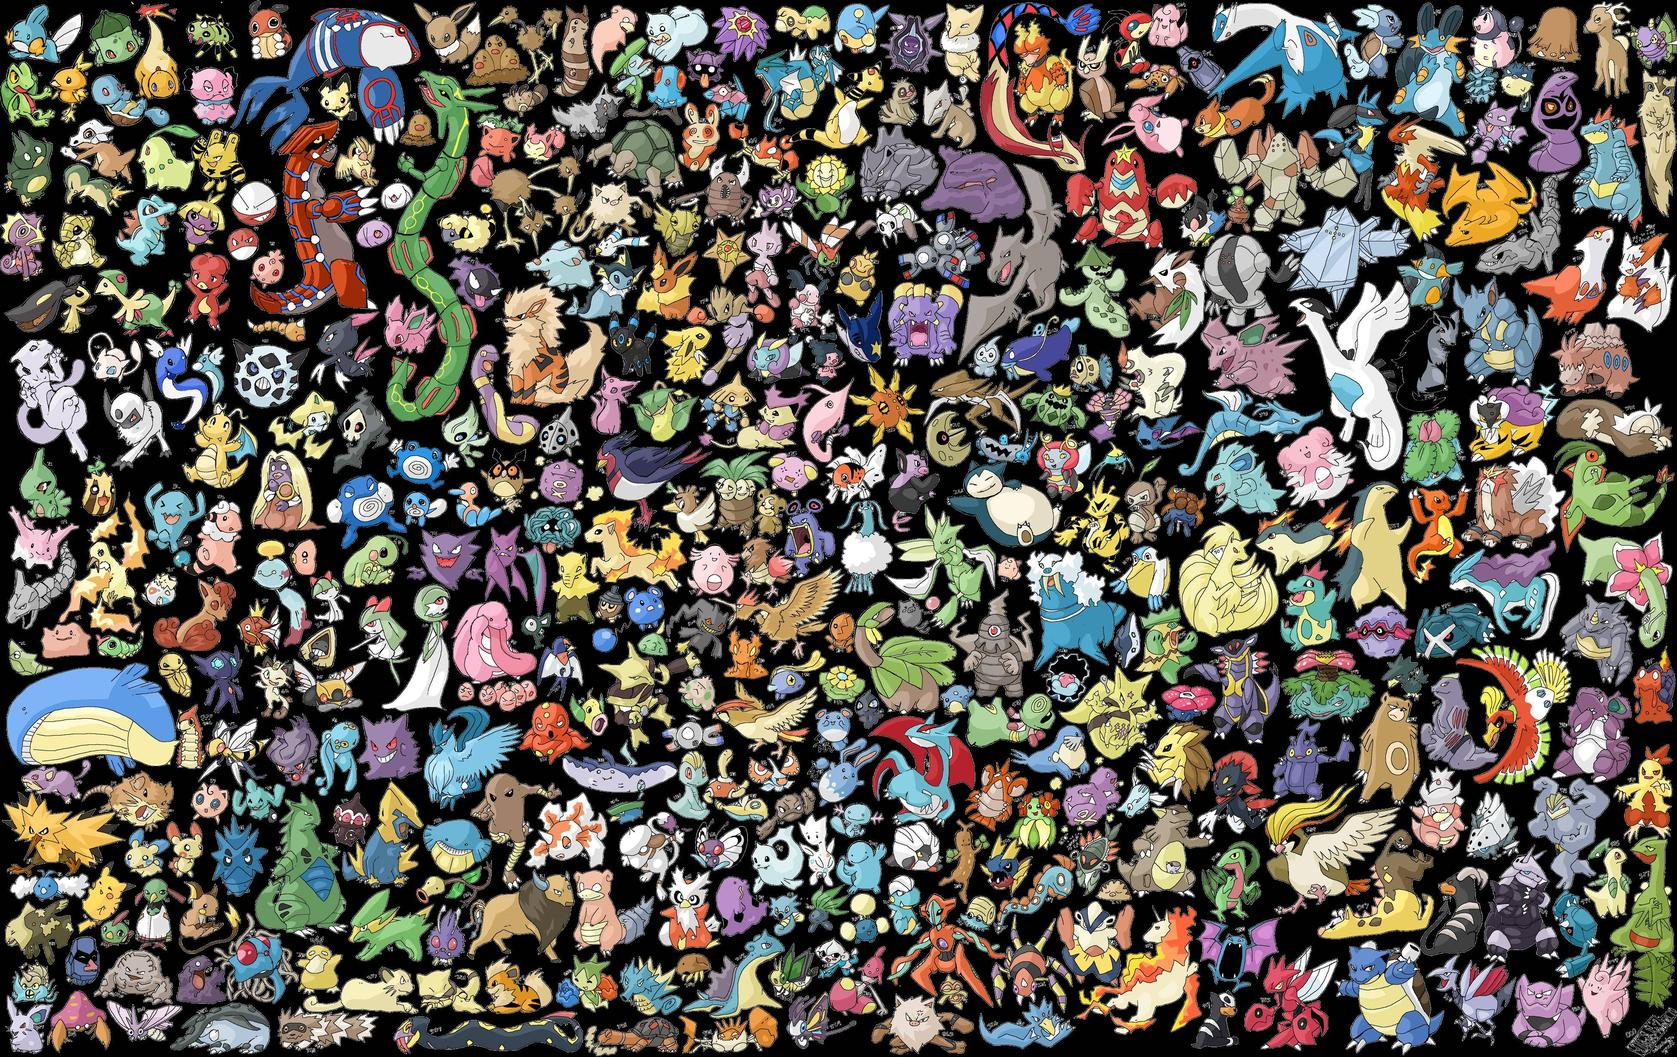 Pokemon Computer Wallpapers Desktop Backgrounds 1677x1057 ID 1677x1057